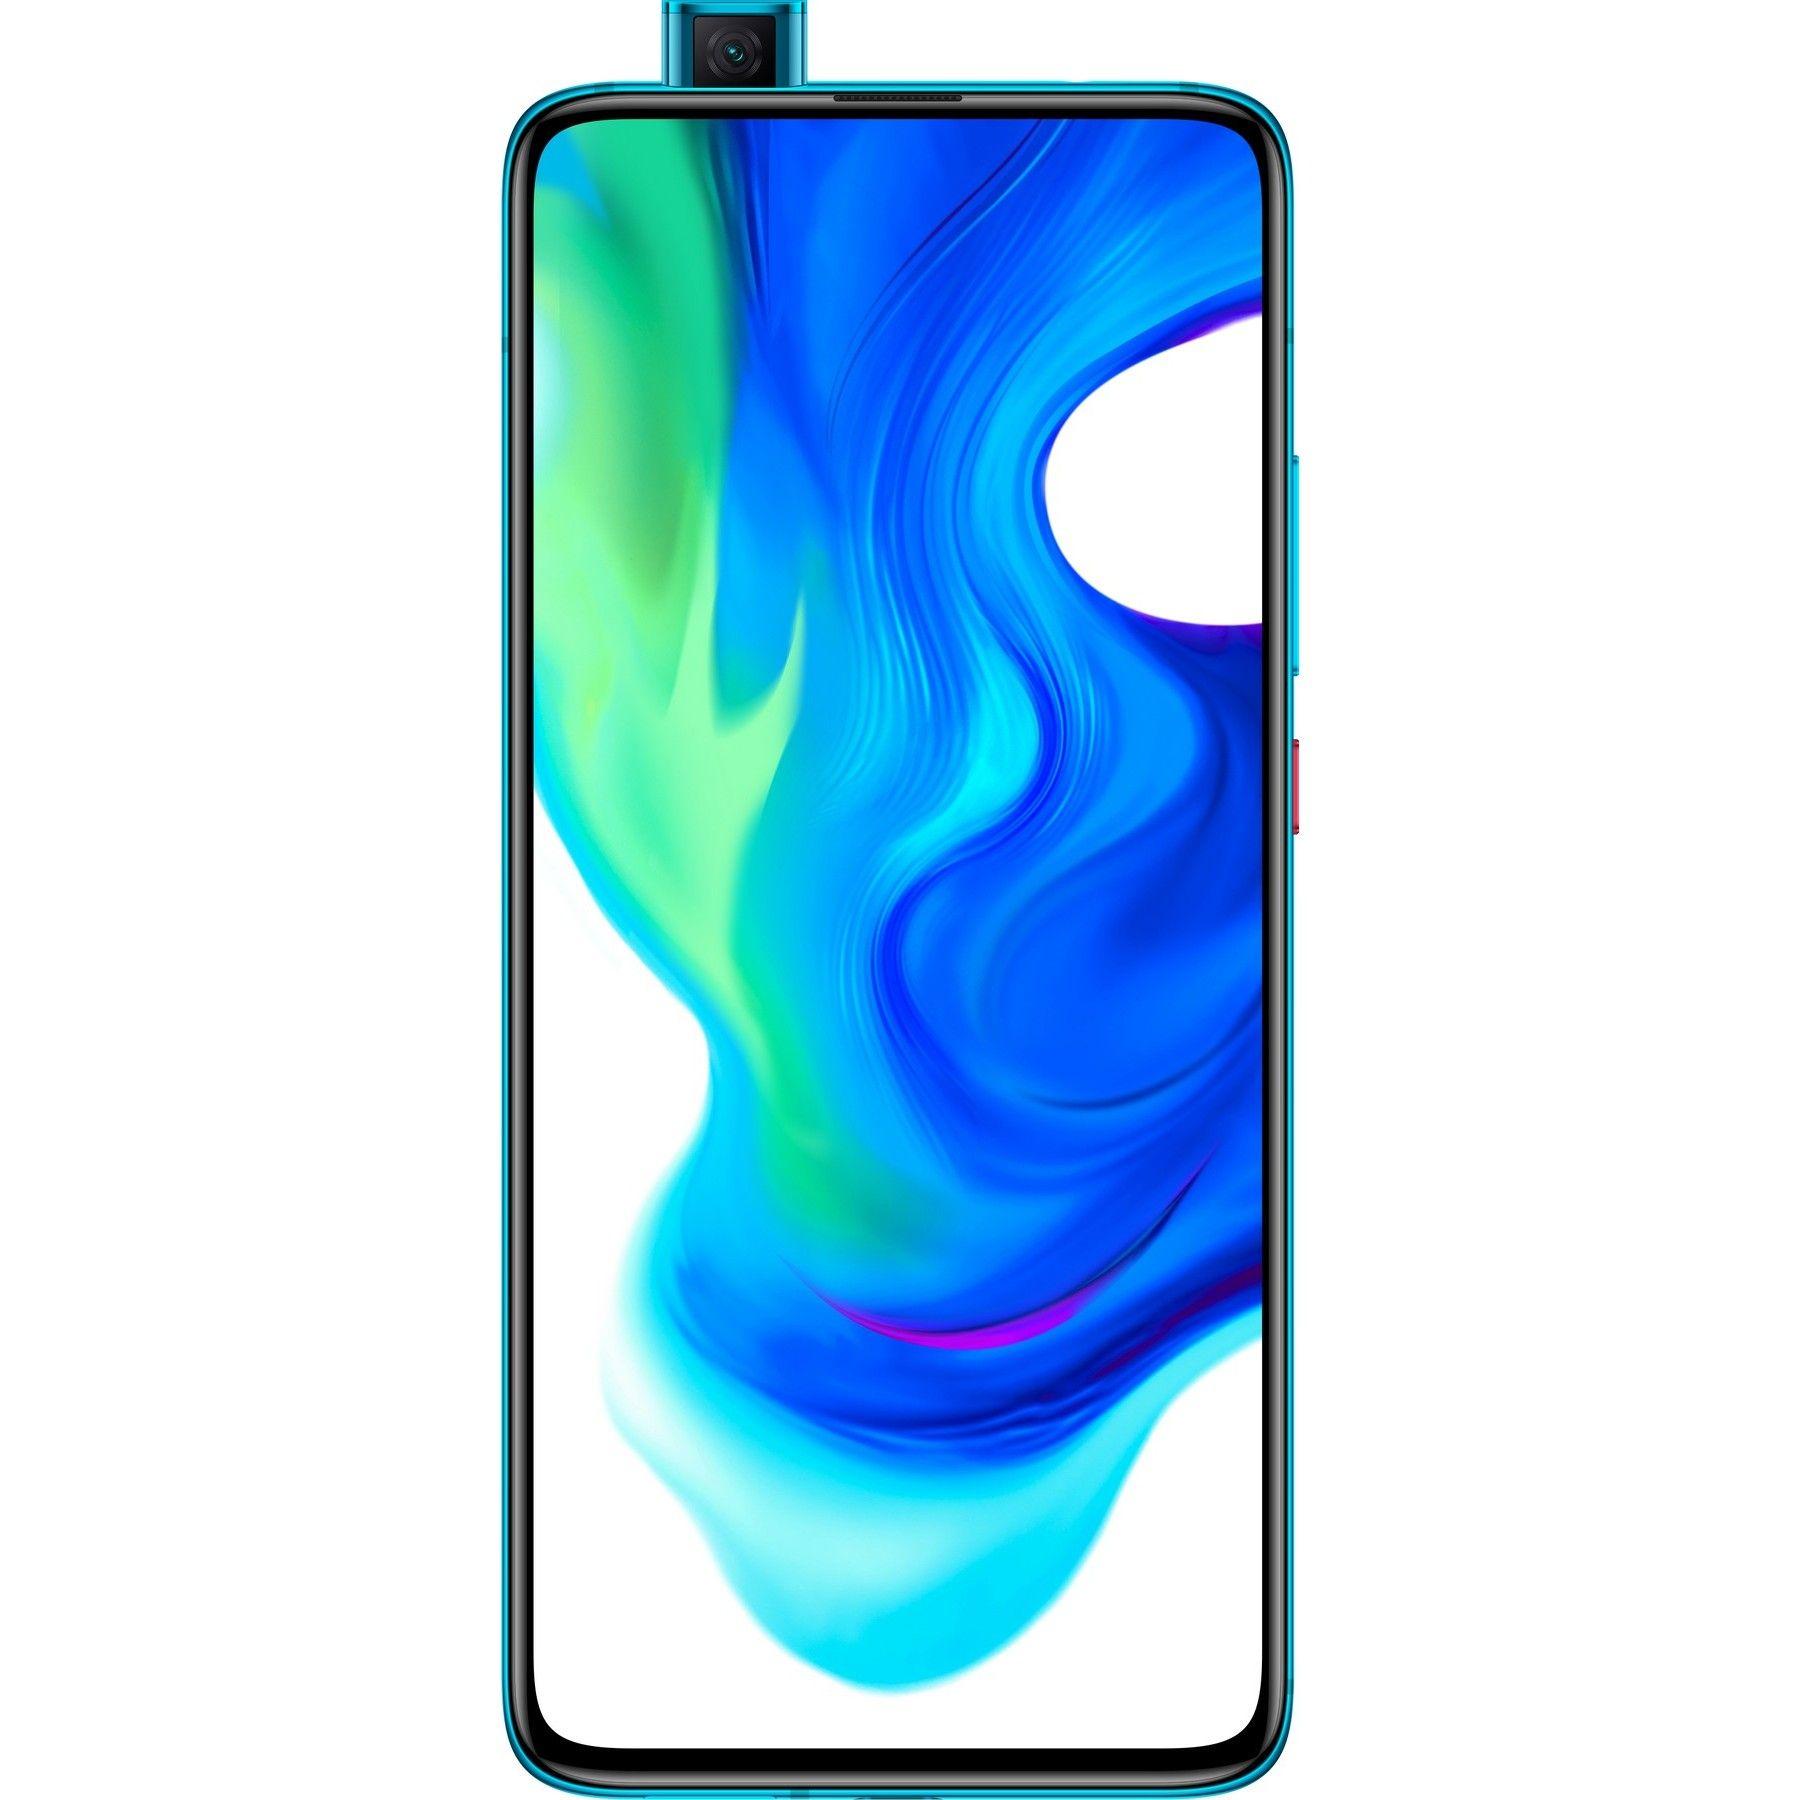 Xiaomi Poco F2 Pro 128/ 6GB - Versand aus EU (5G, SD865, 6.67